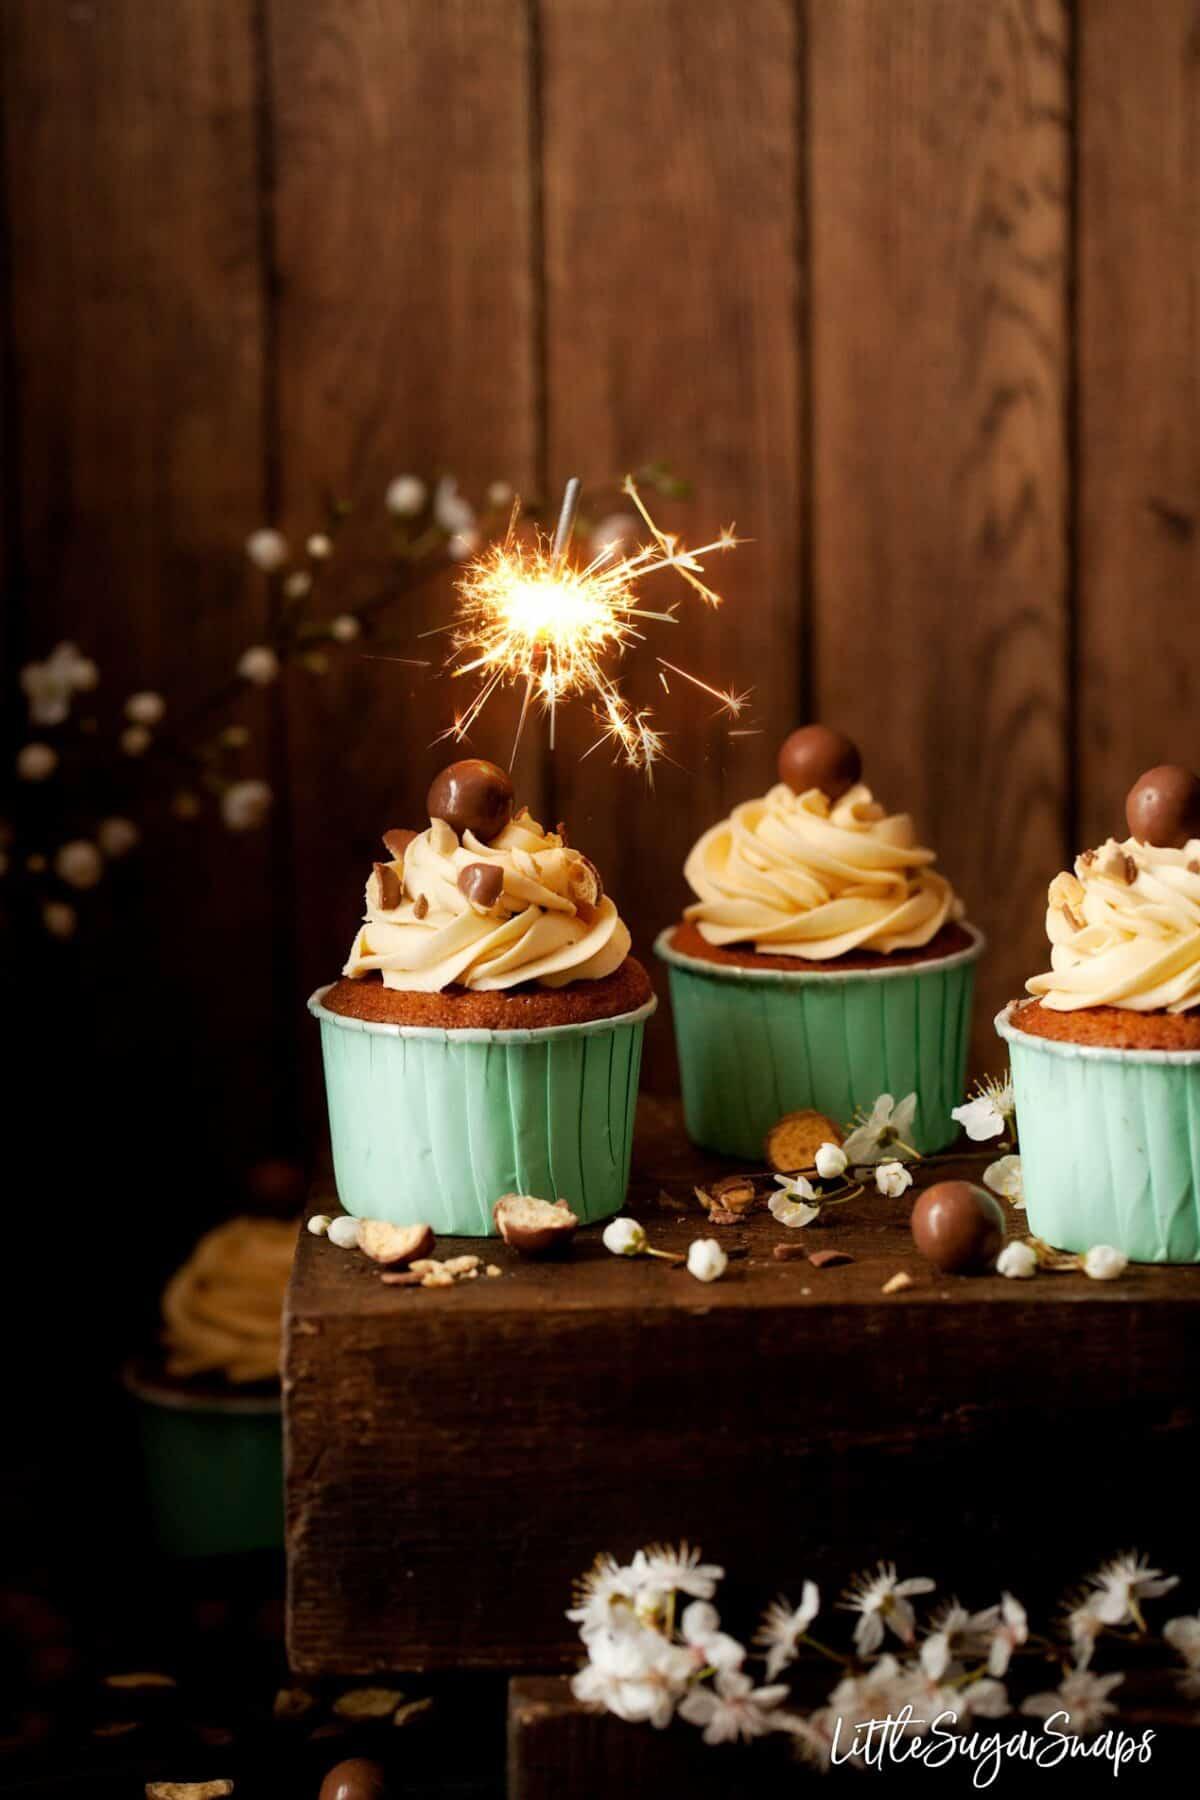 Vanilla Malt Cupcakes with a sparkler